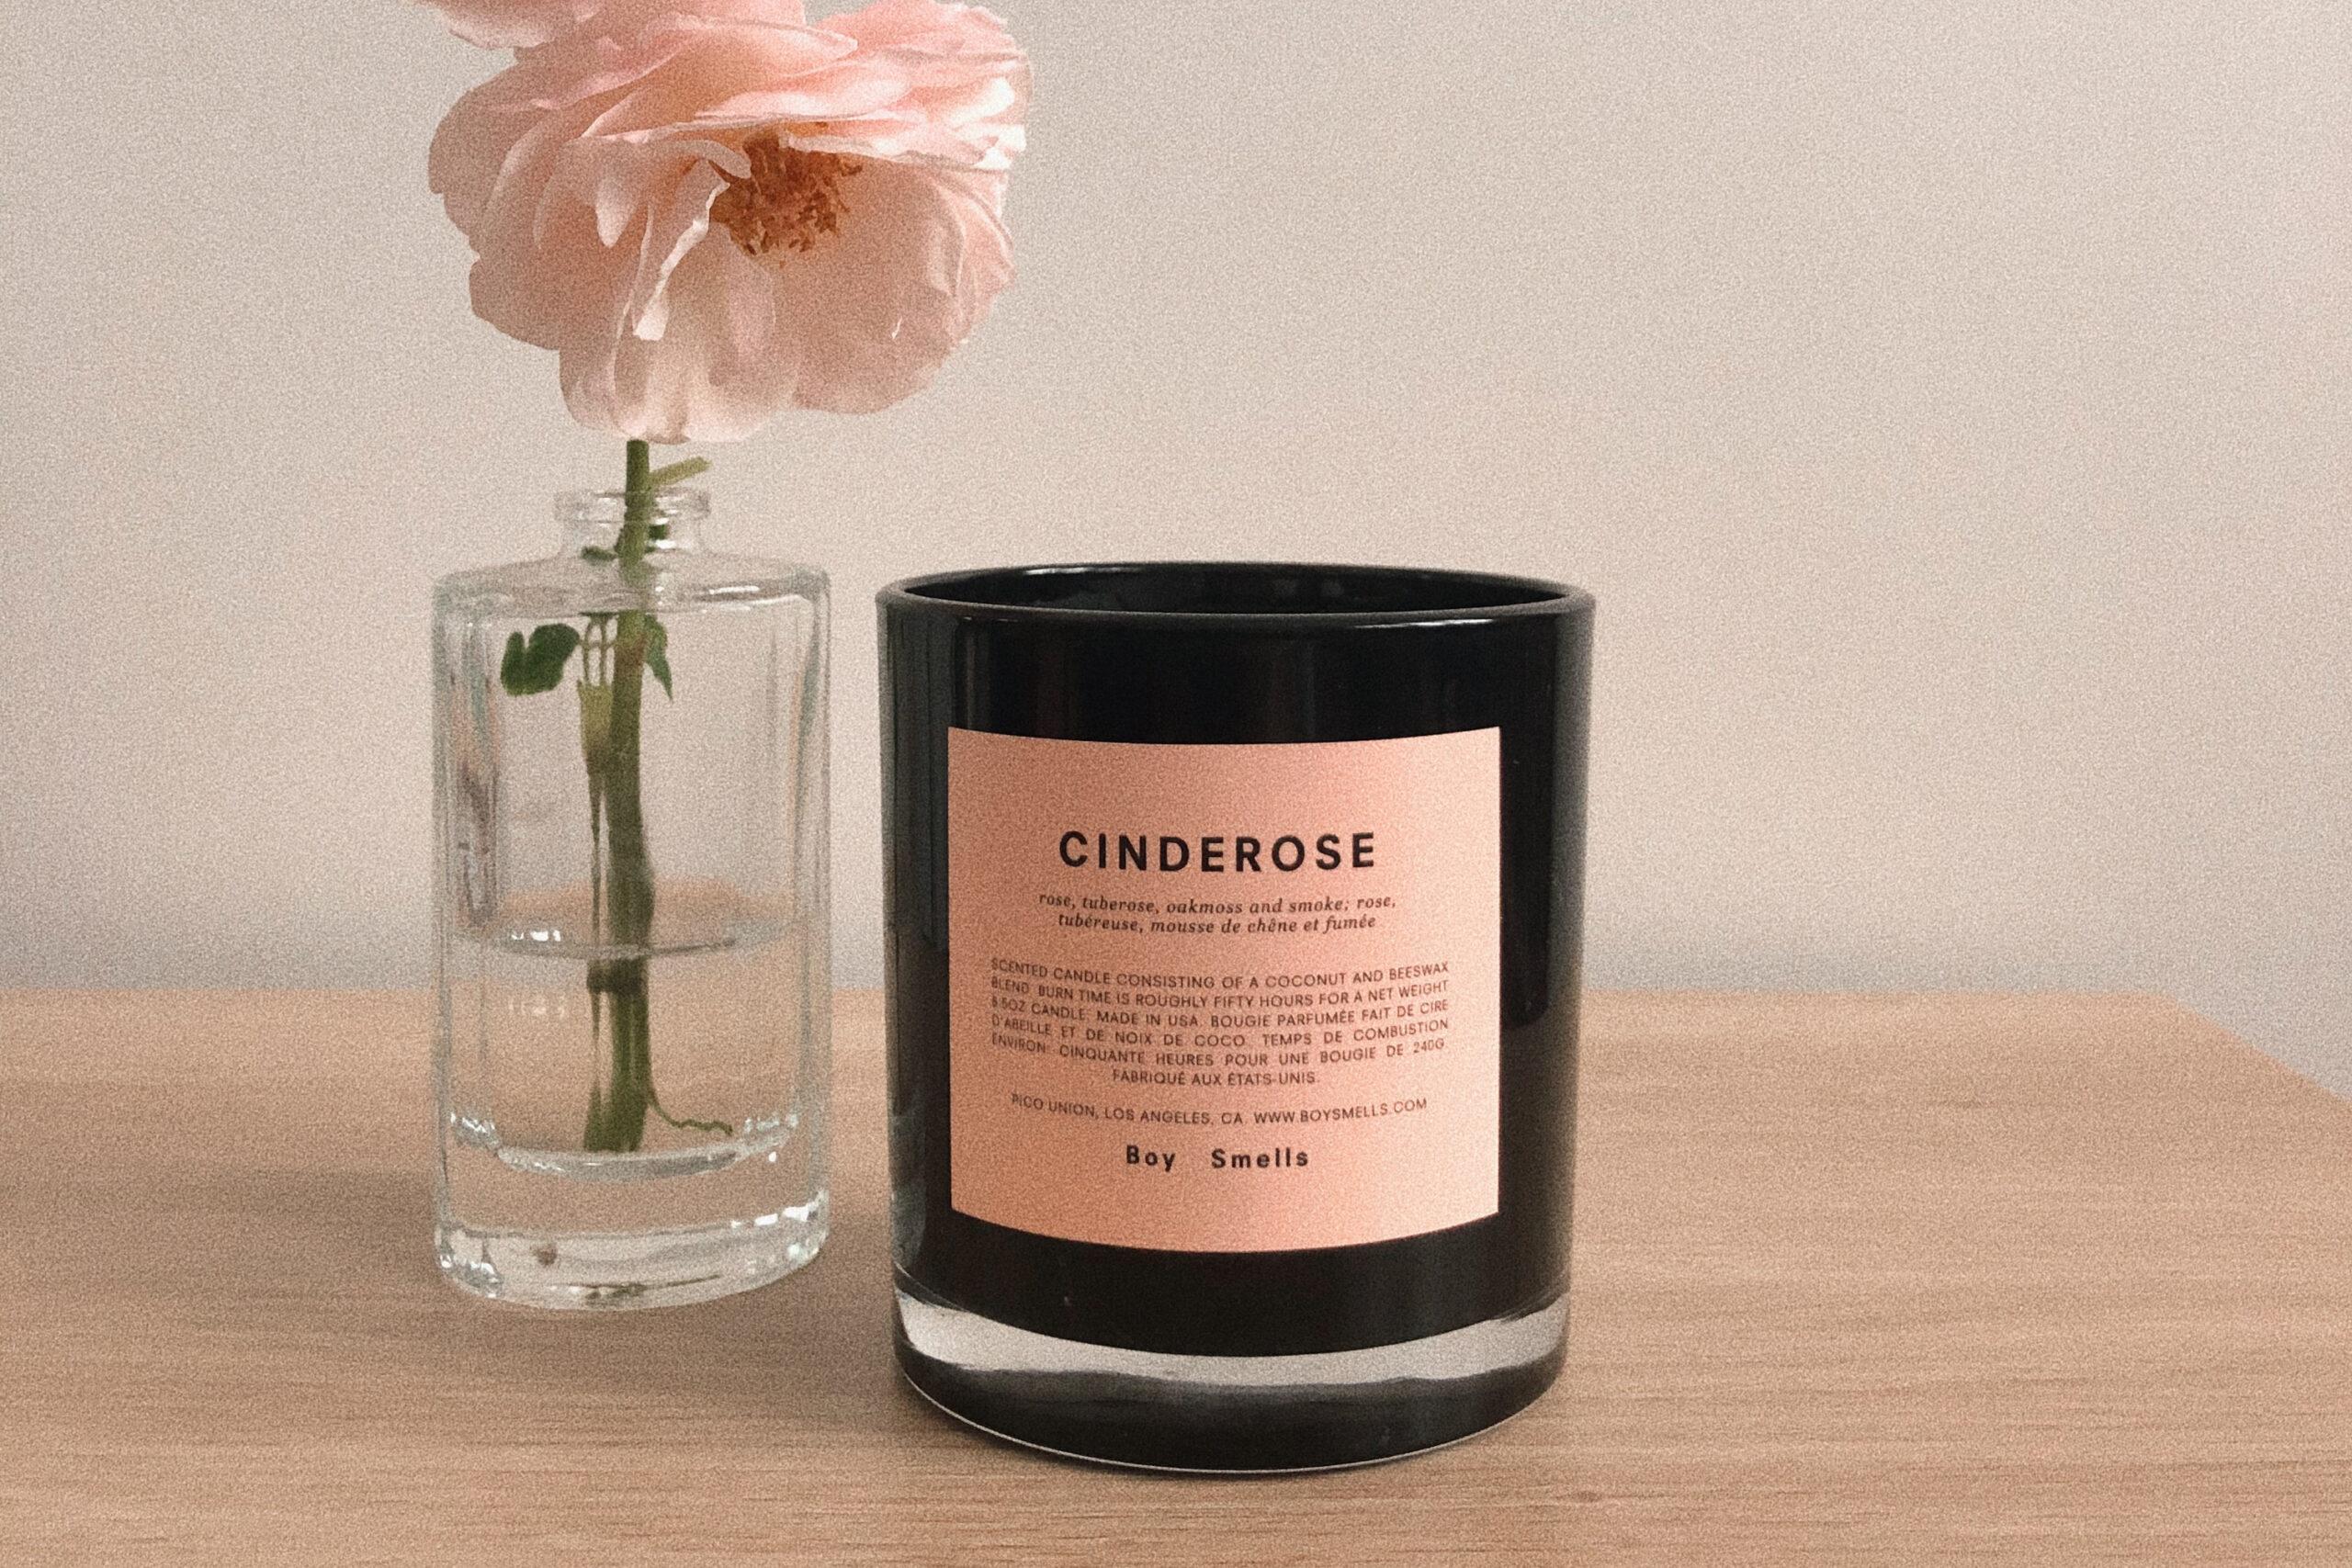 Cinderose by Boy Smells